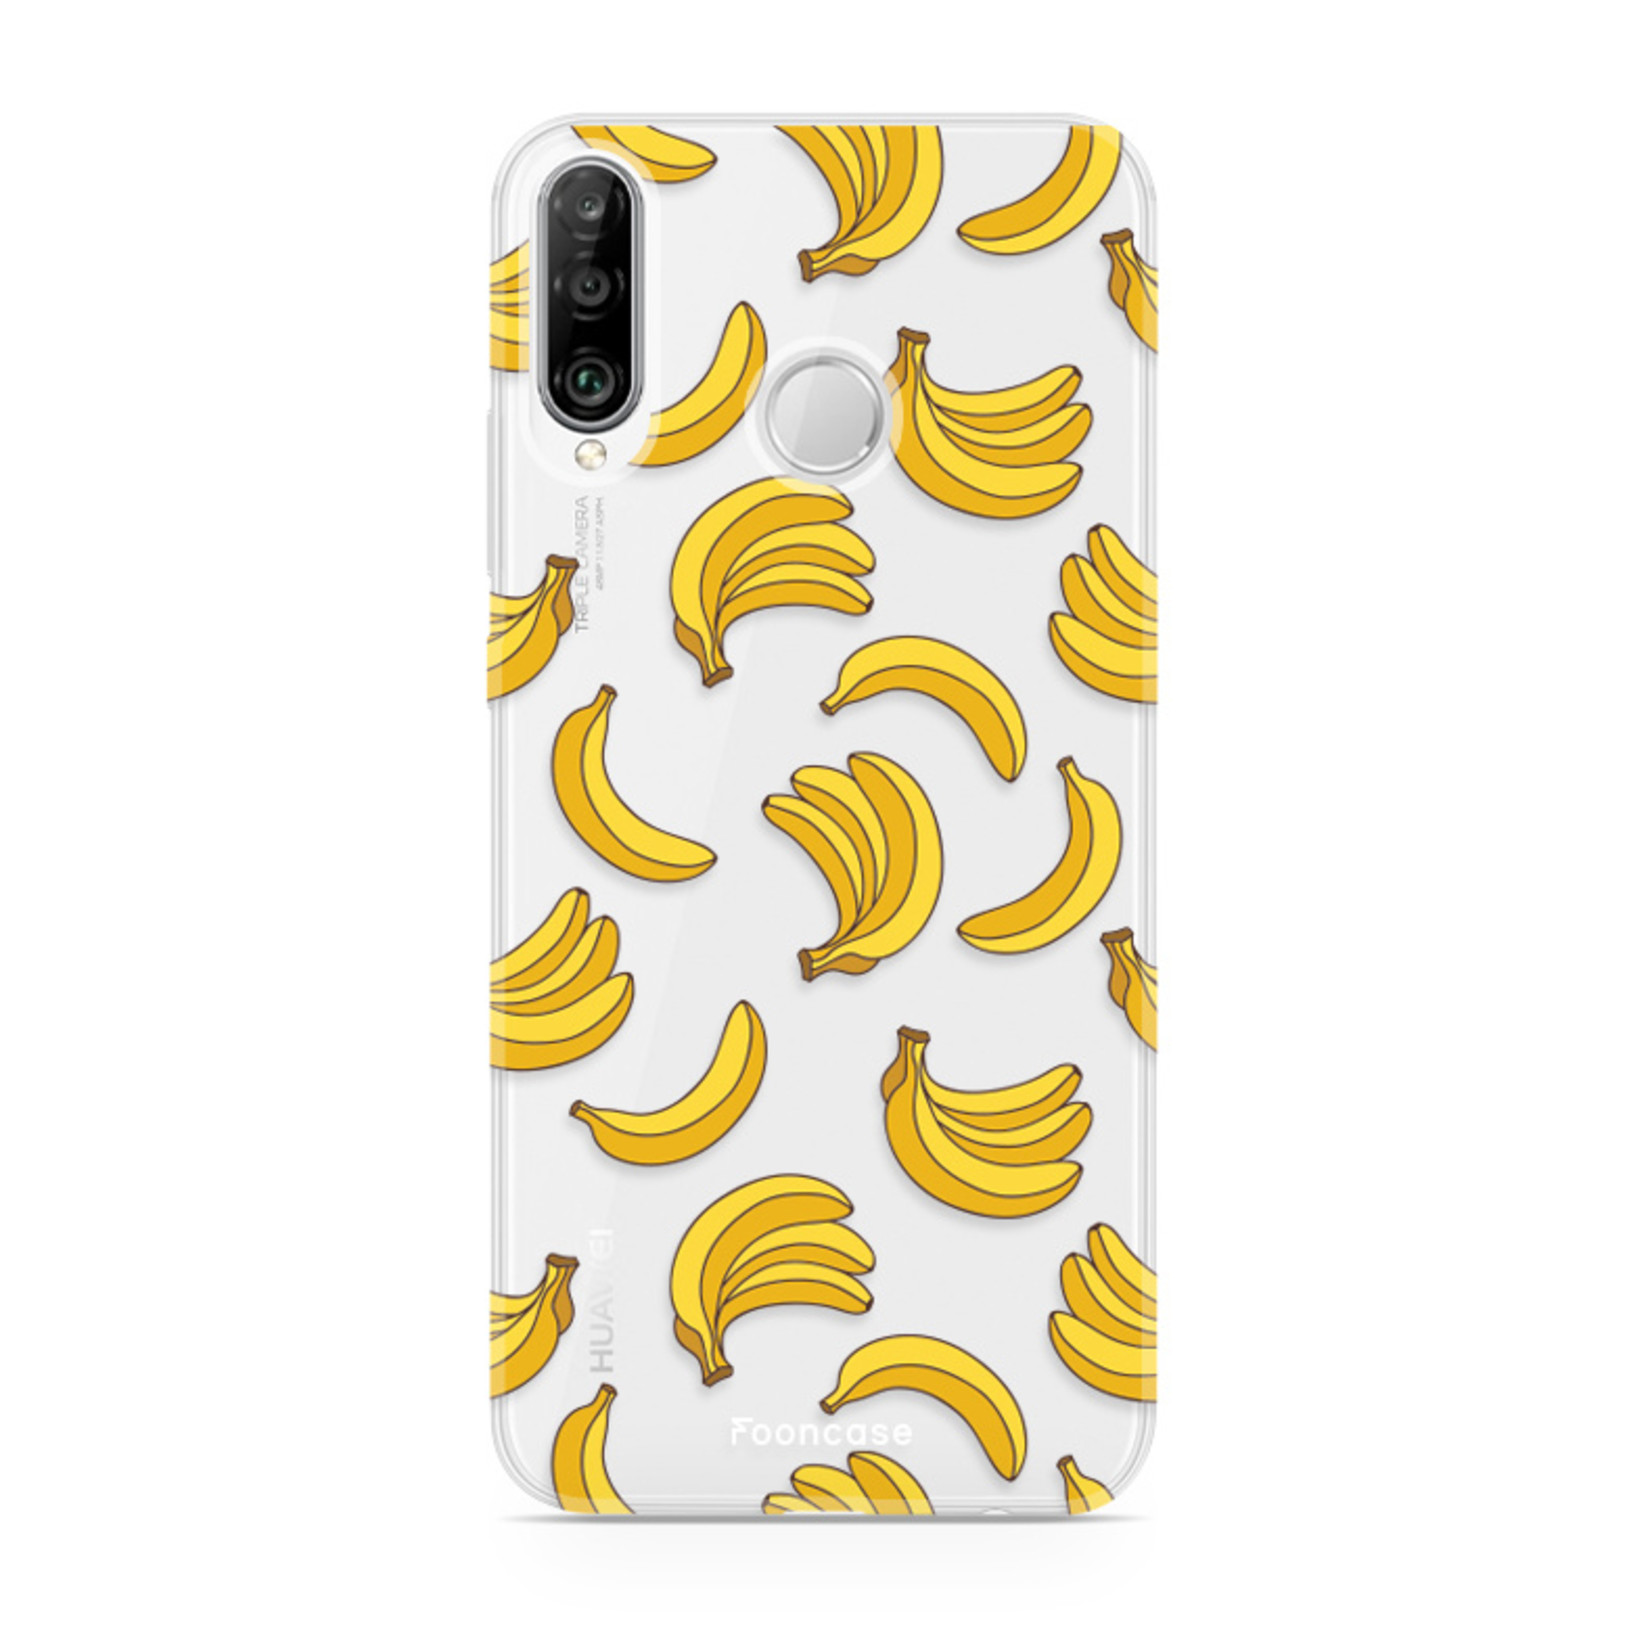 FOONCASE Huawei P30 Lite hoesje TPU Soft Case - Back Cover- Bananas / Banaan / Bananen